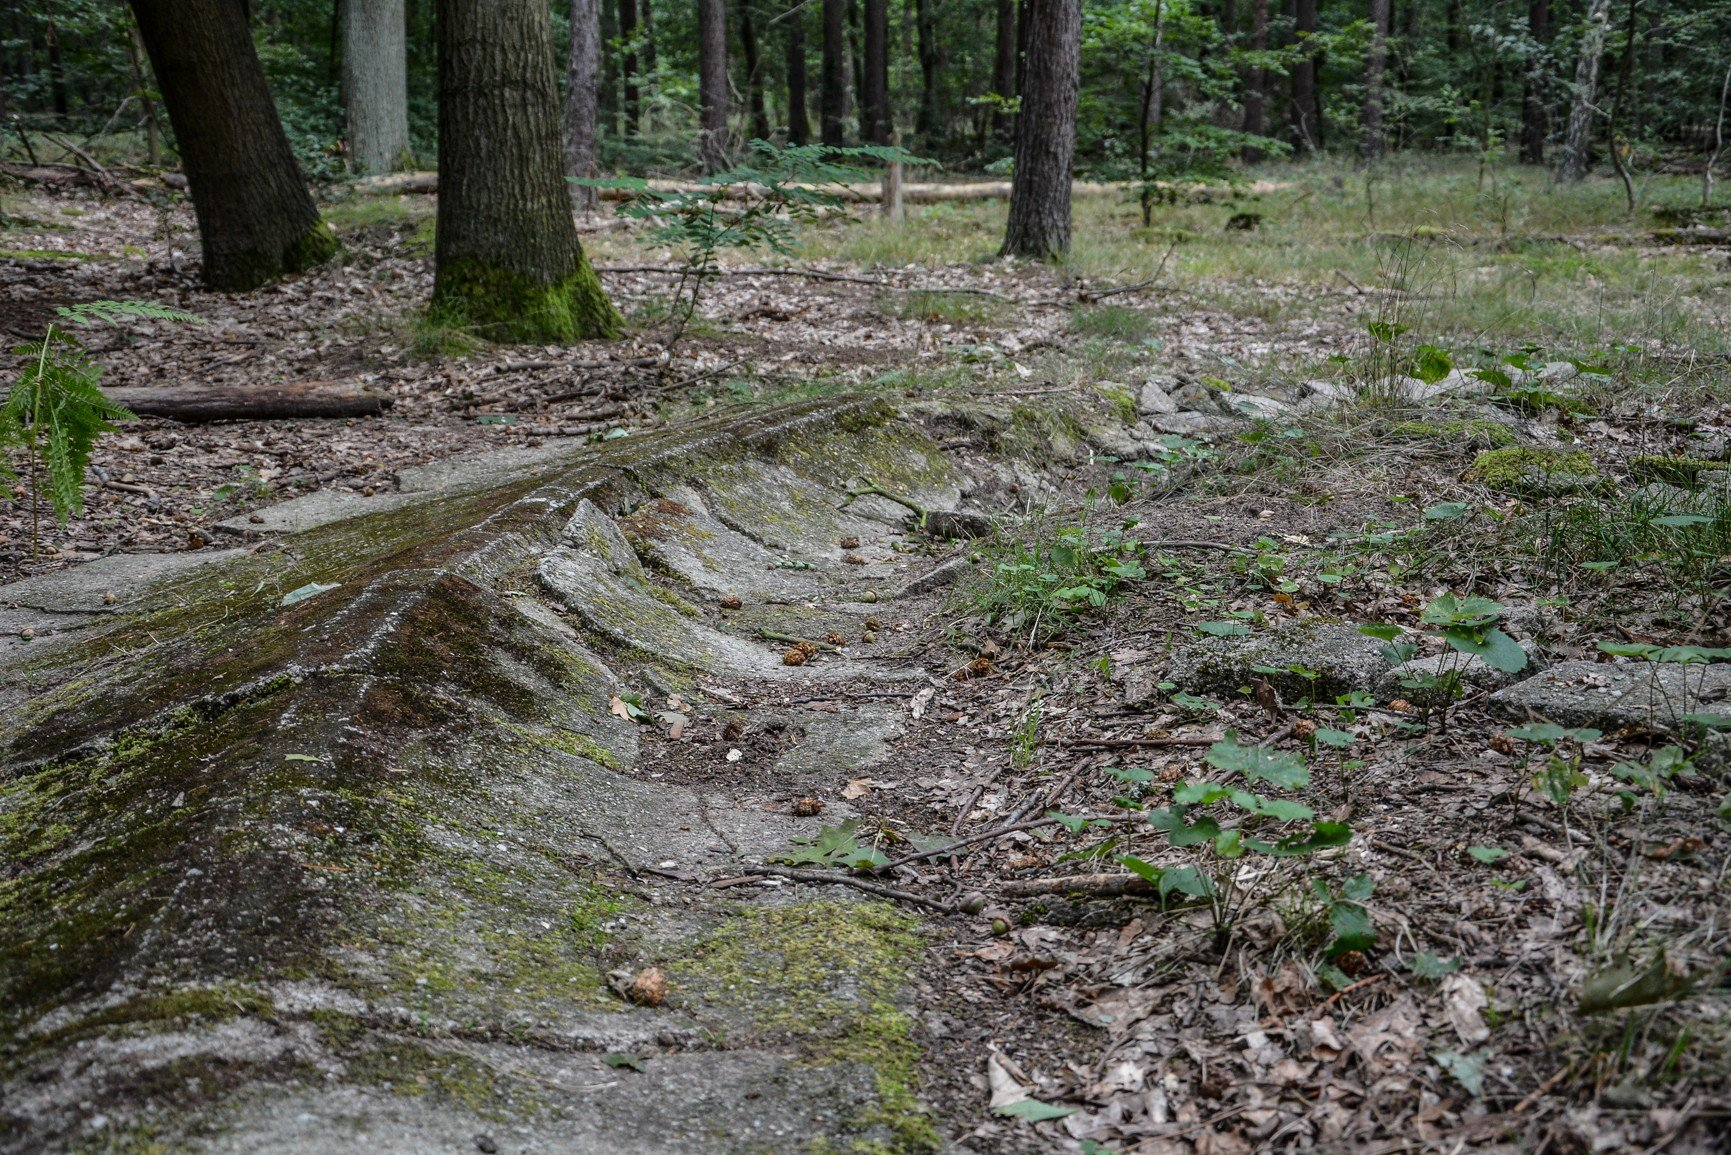 modell ruine kurve südkurve avus suedkurve modell berlin charlottenburg lost places urbex abandoned berlin